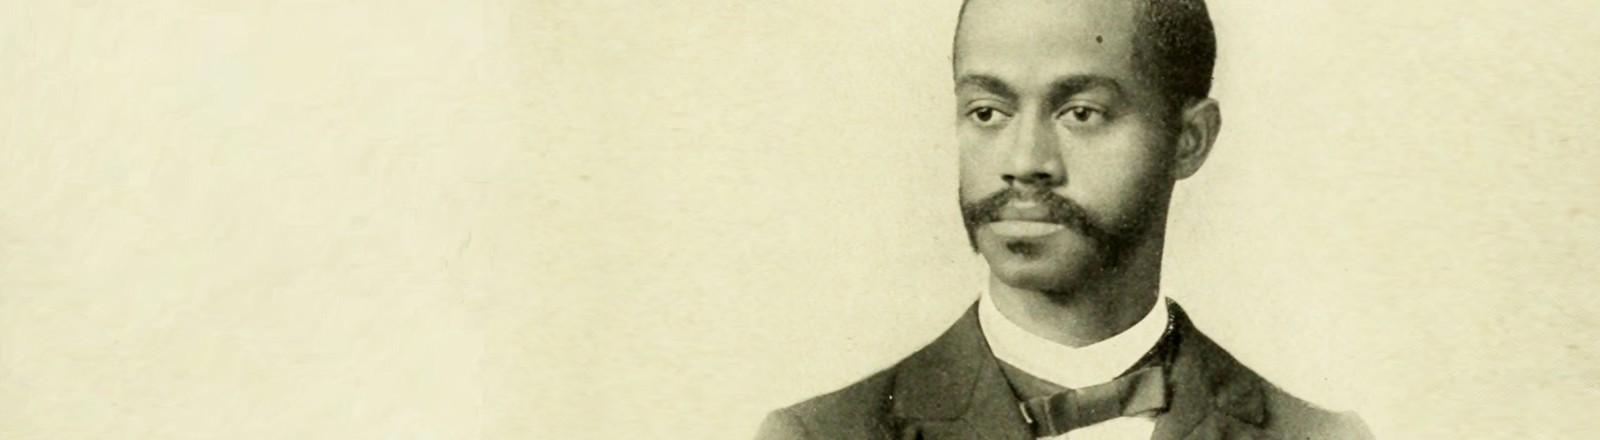 Ein altes Foto des Biologen Charles H. Turner